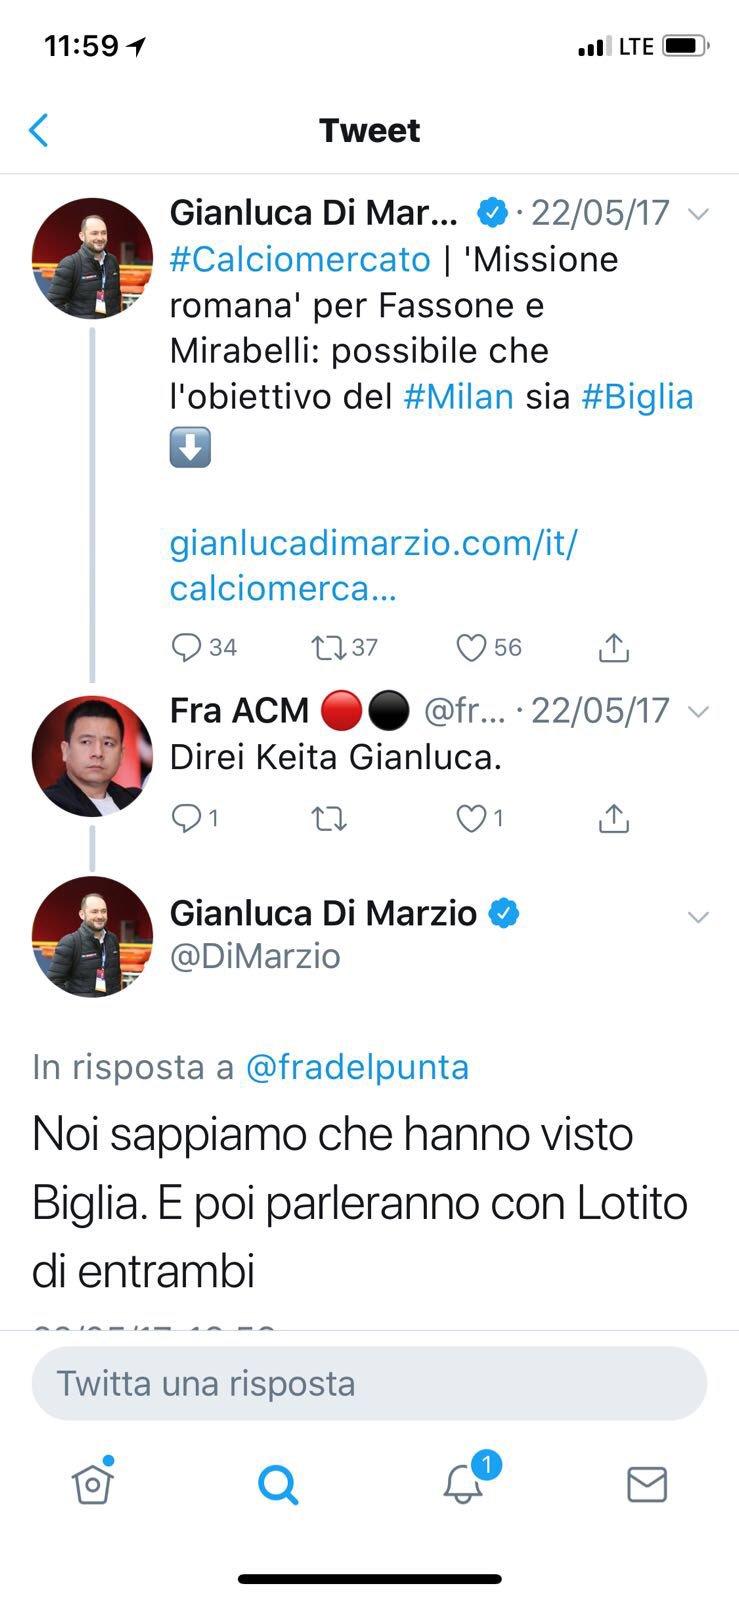 Gianluca Di Marzio Pa Twitter Ps Ecco Il Tweet